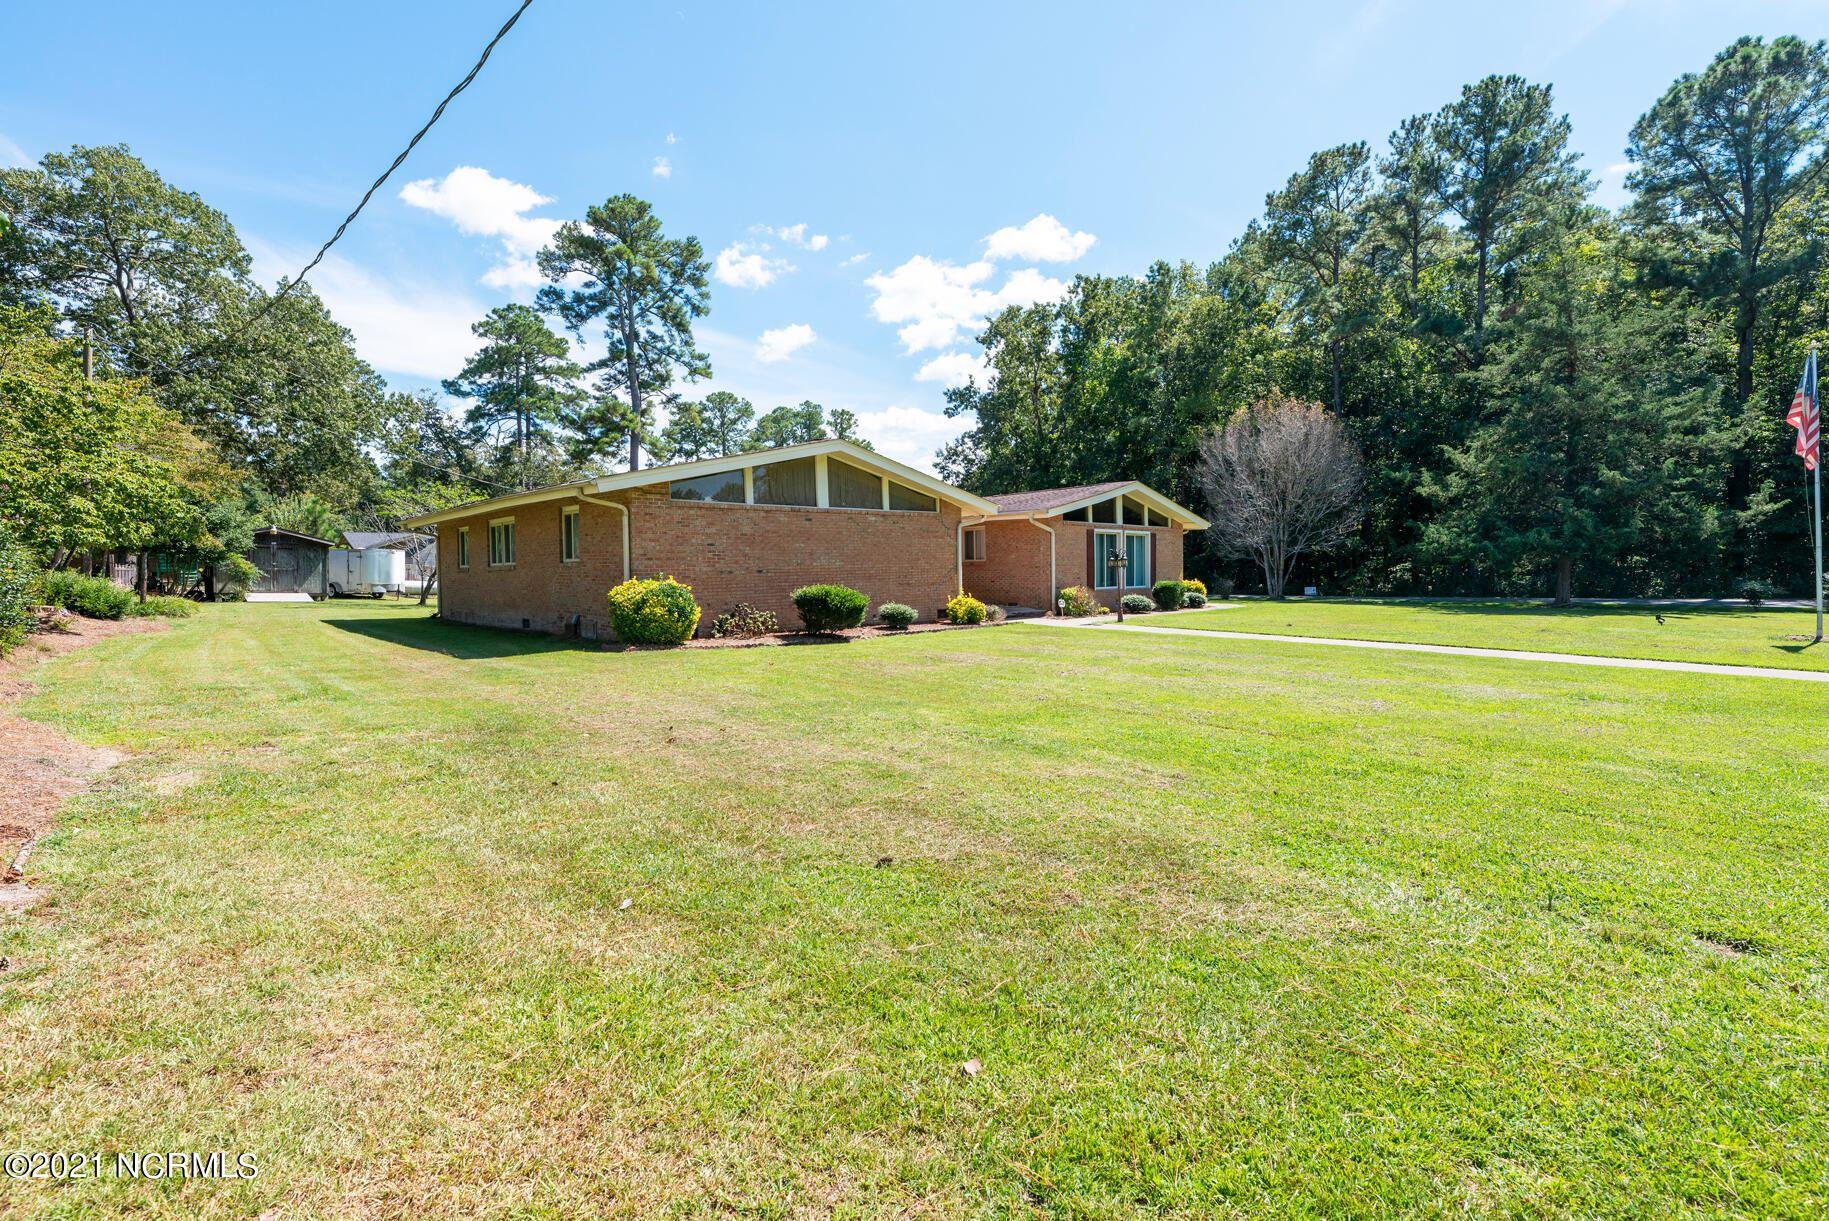 Photo of 1375 Oakview Road, Williamston, NC 27892 (MLS # 100290435)